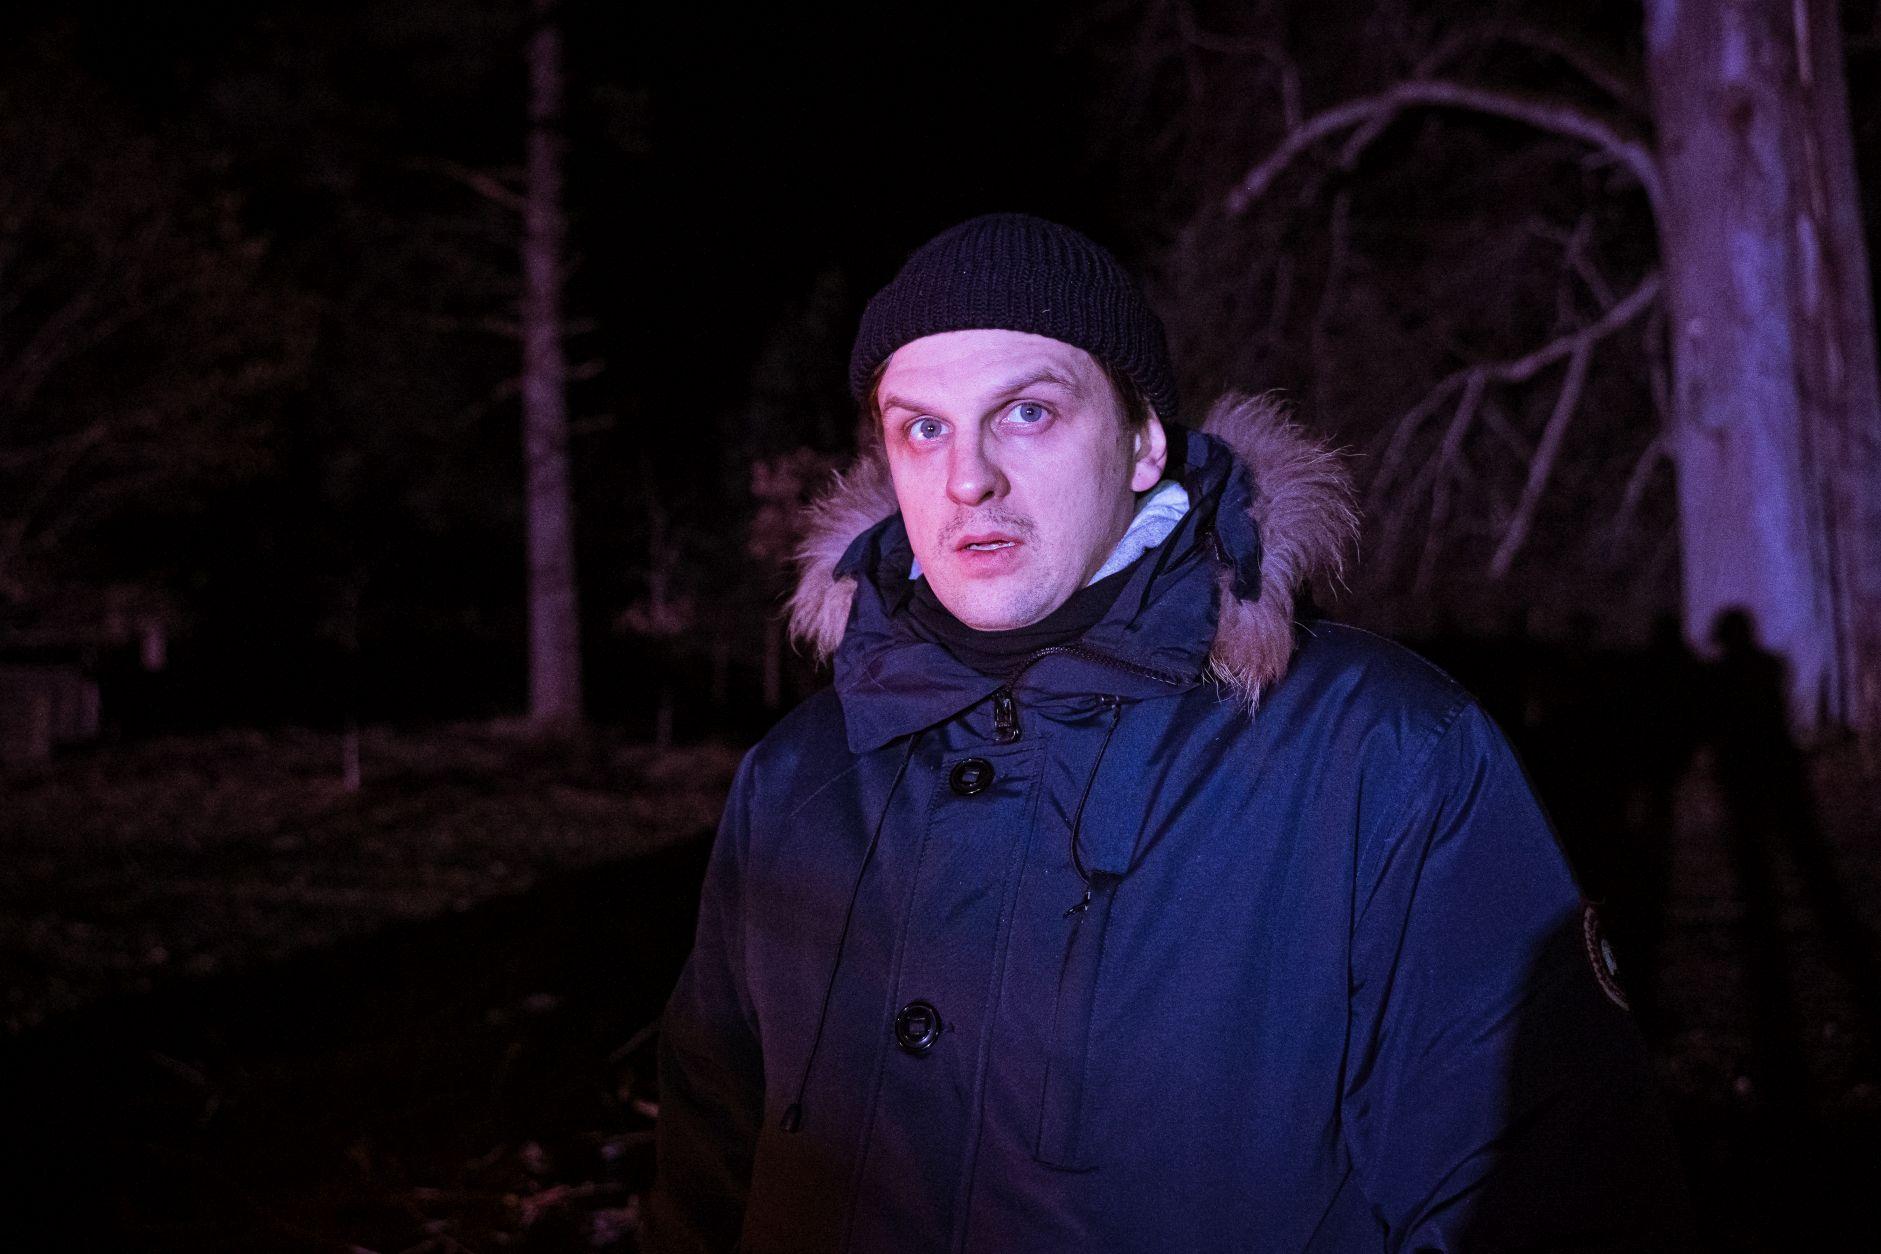 Stovi miške naktį.